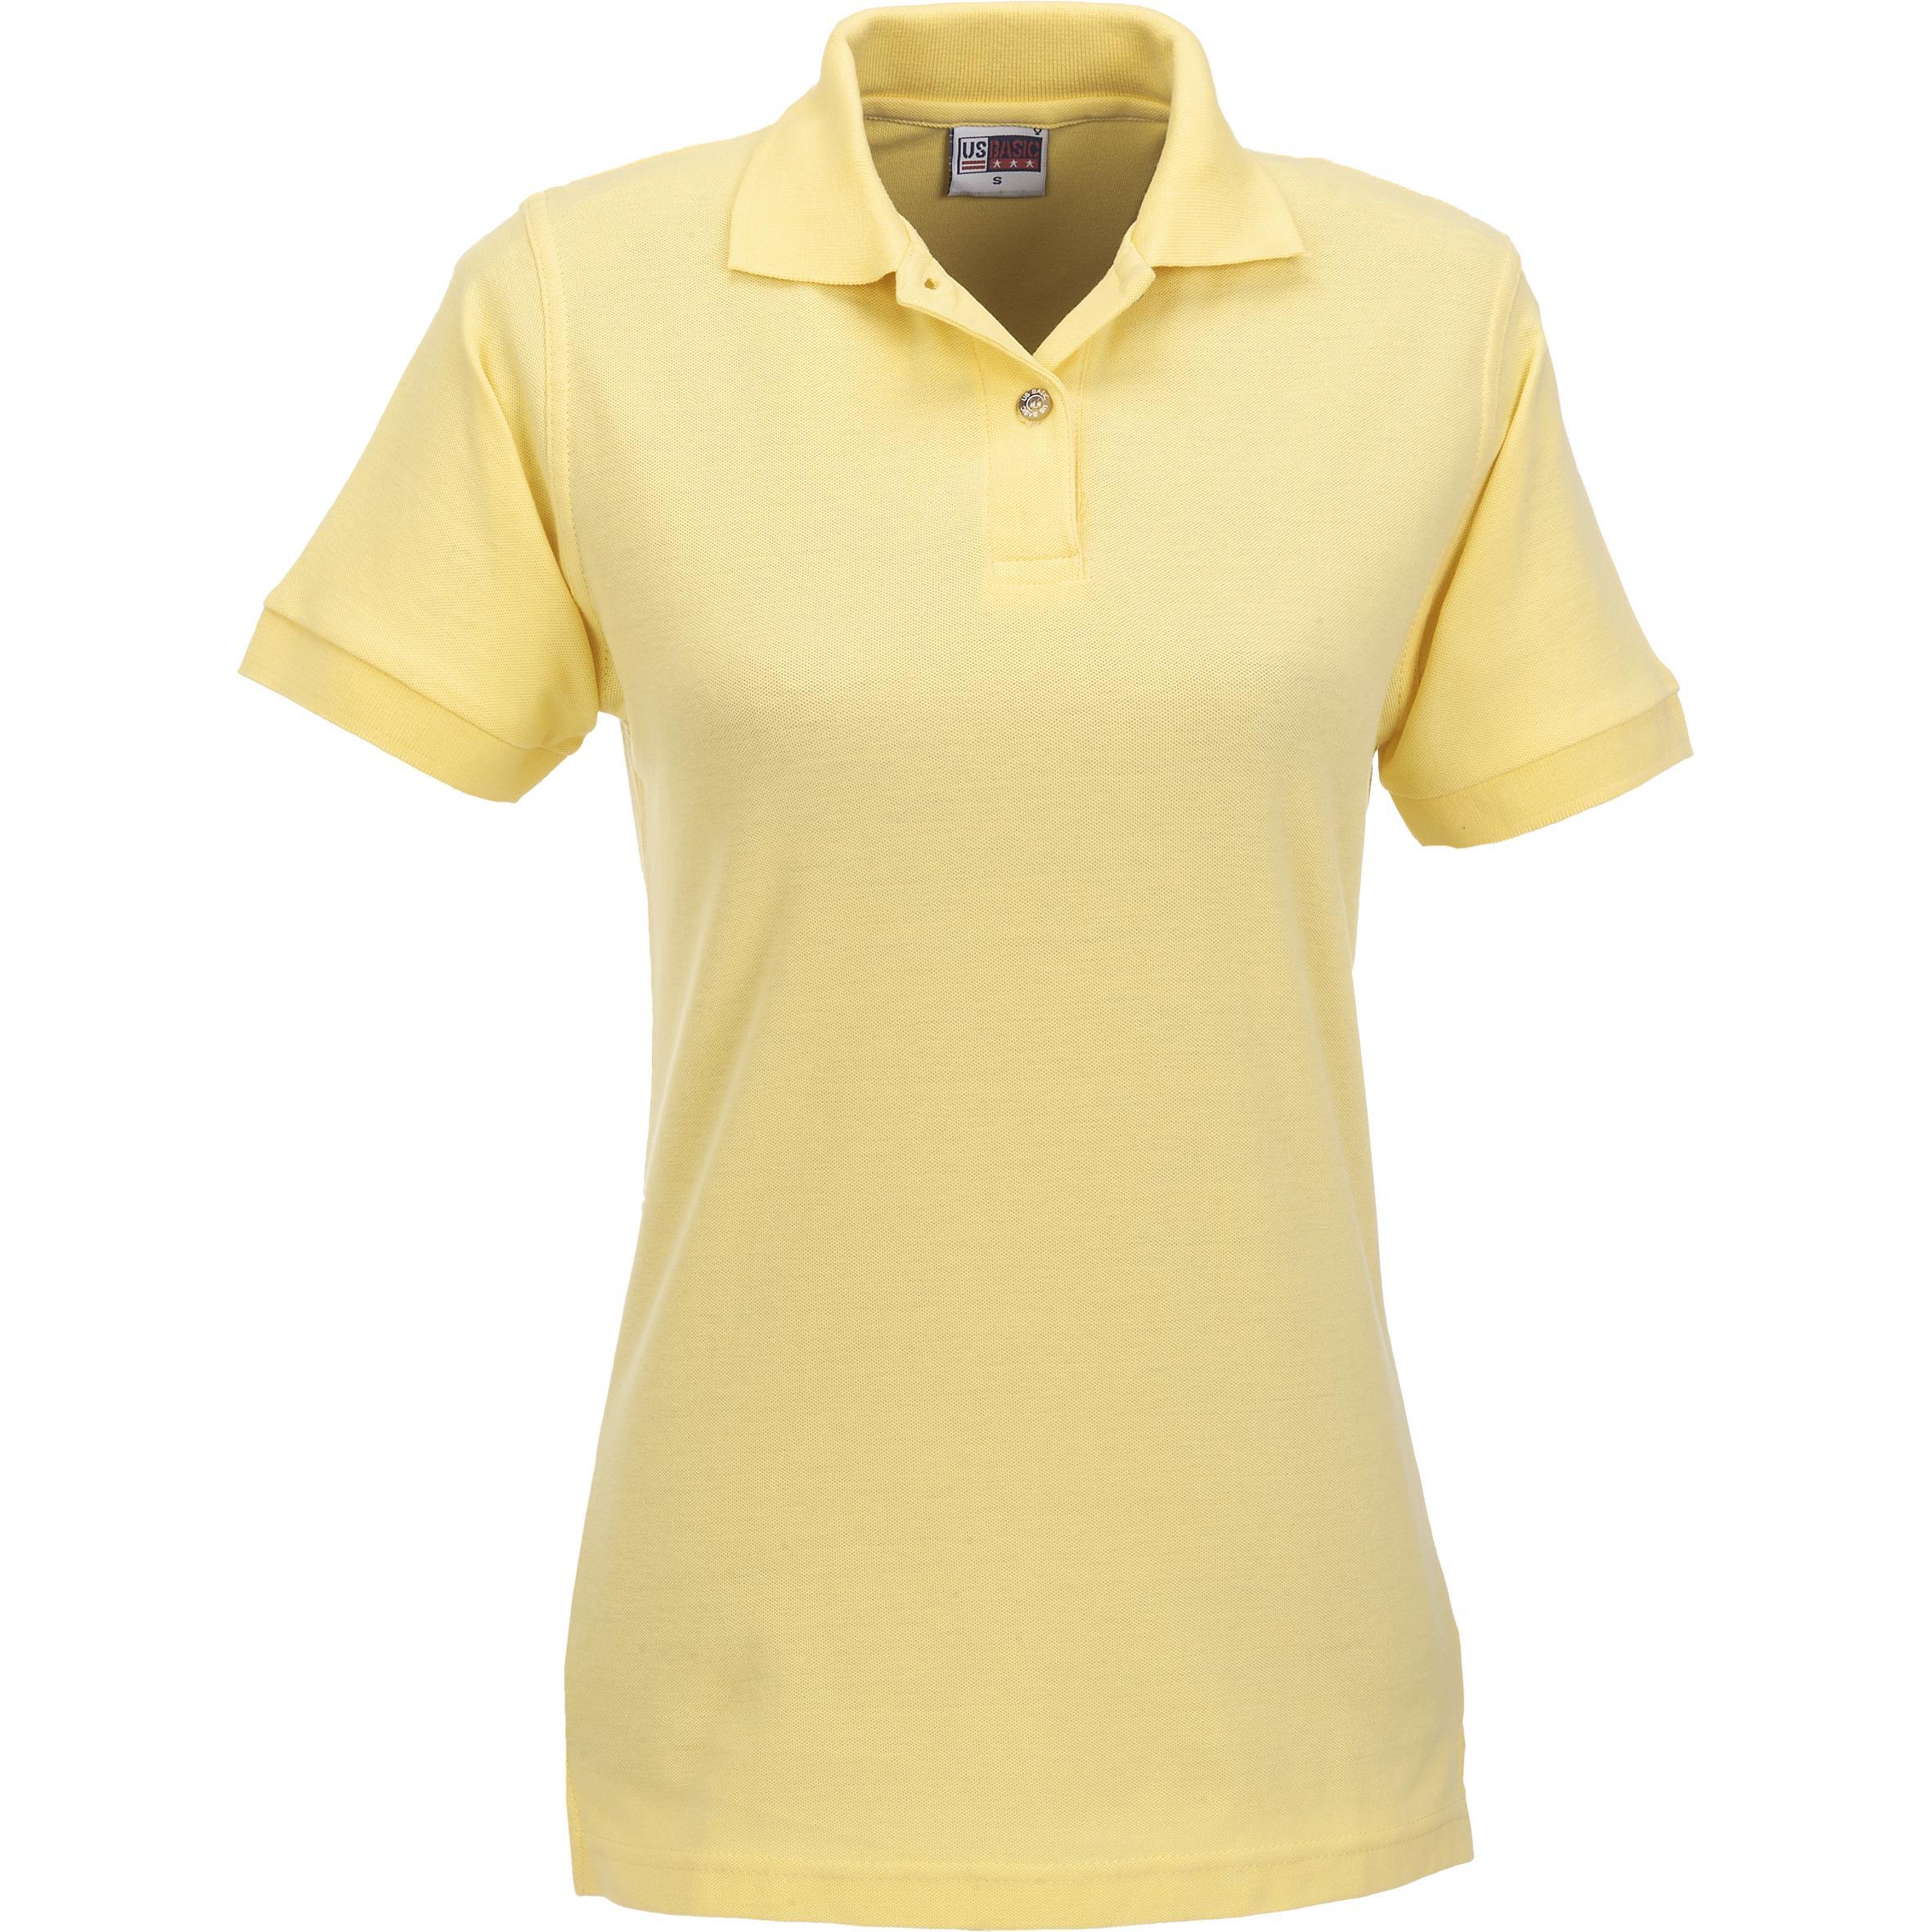 Ladies Boston Golf Shirt - Yellow Only